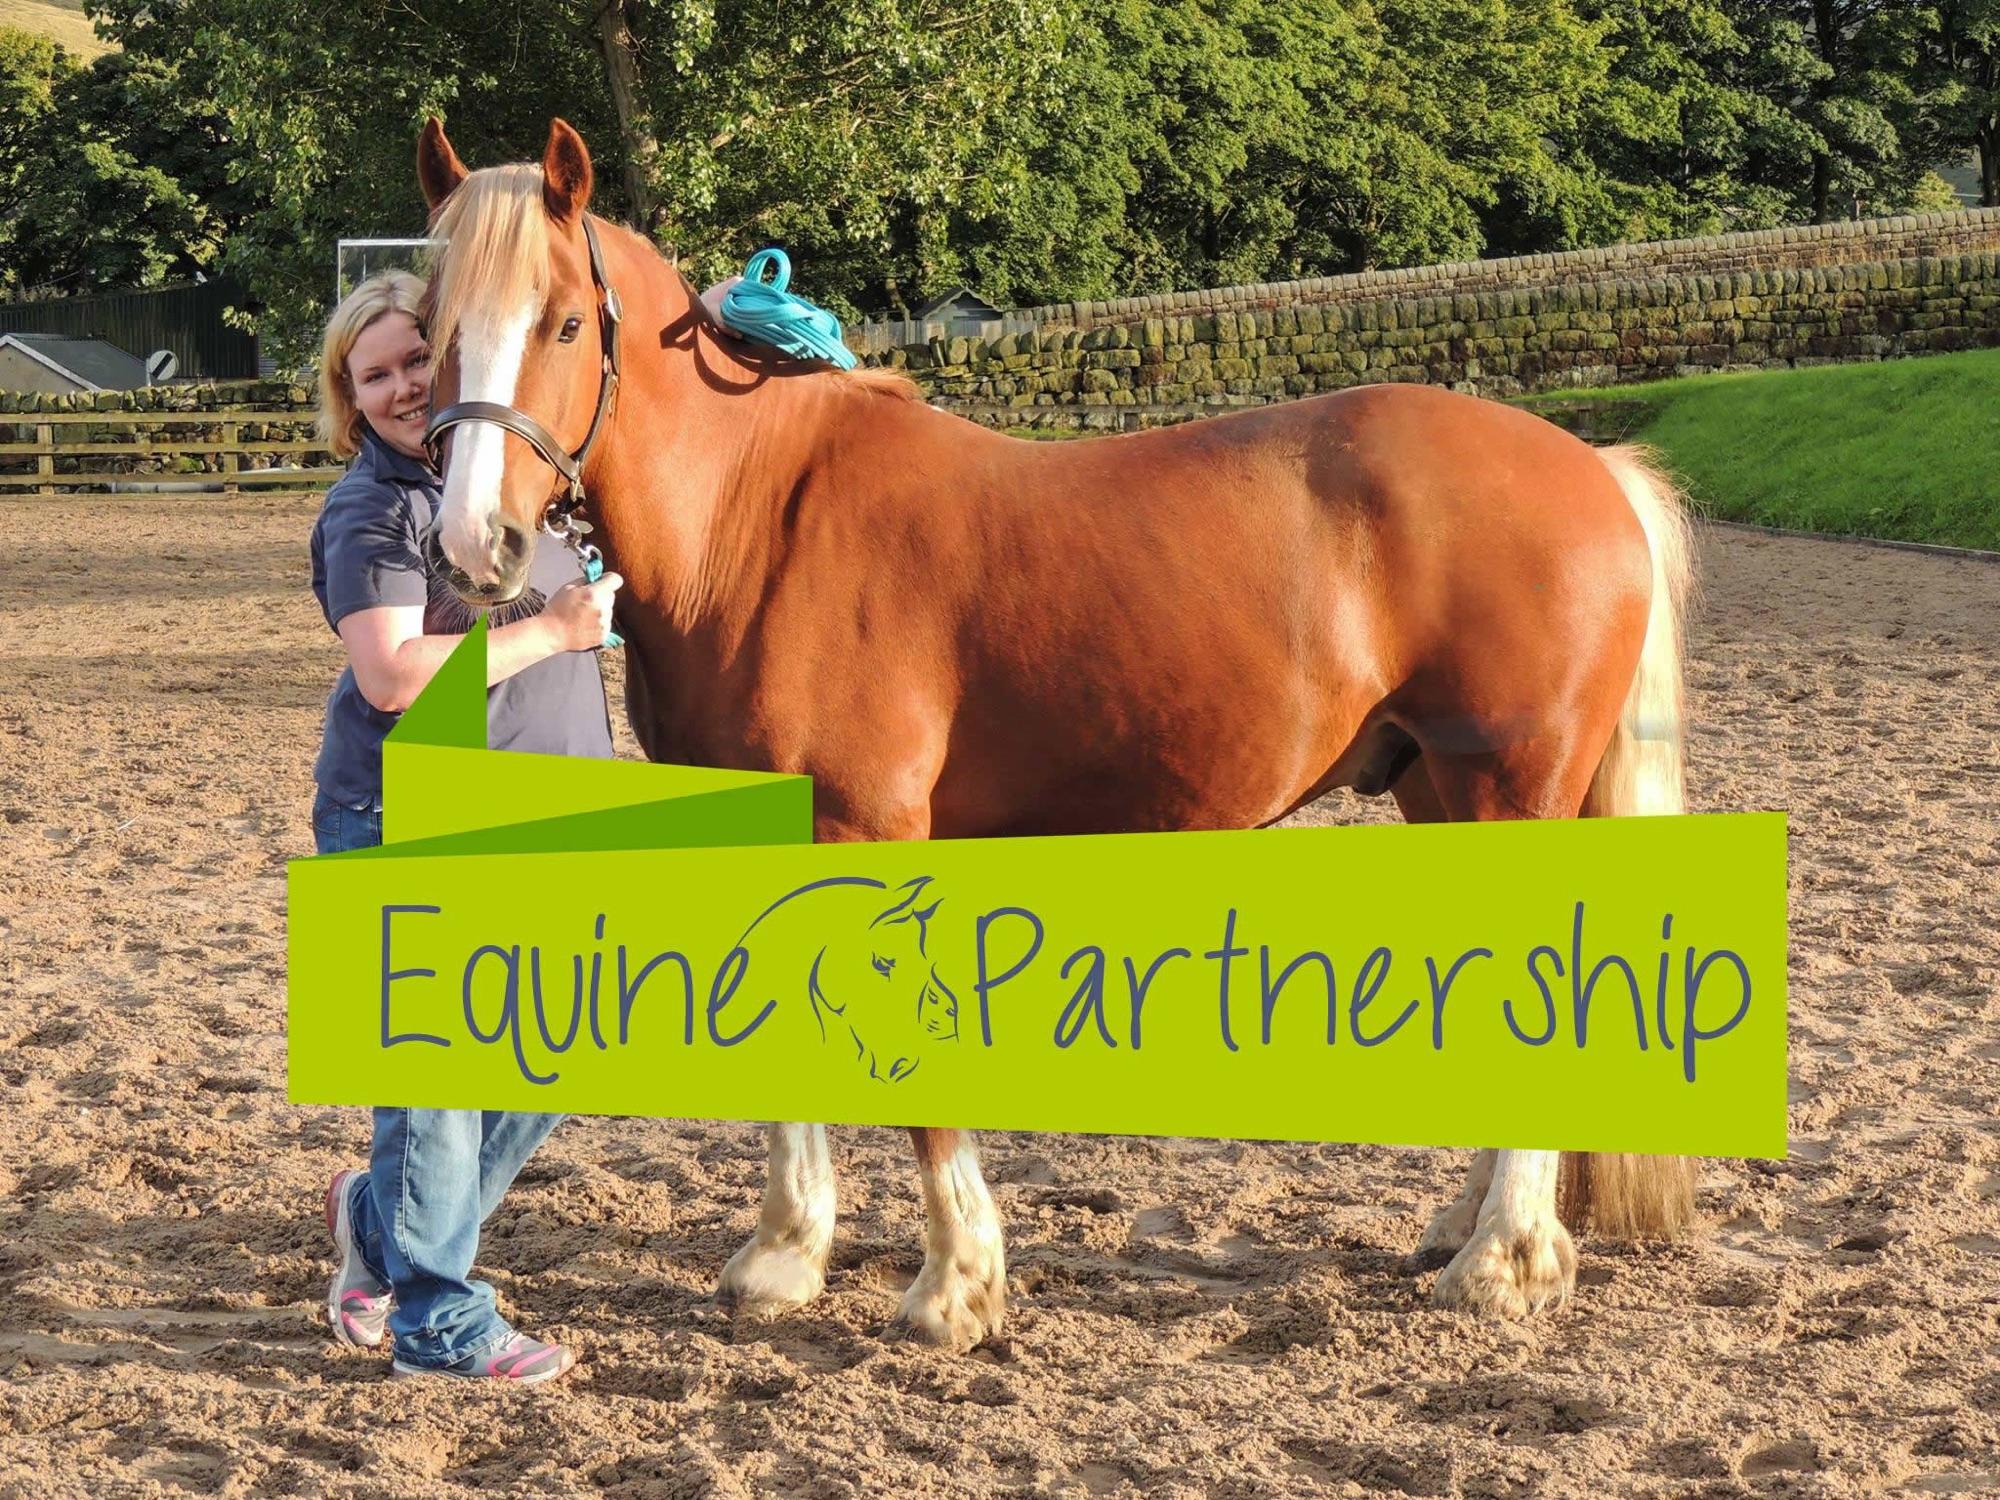 Equine partnreship